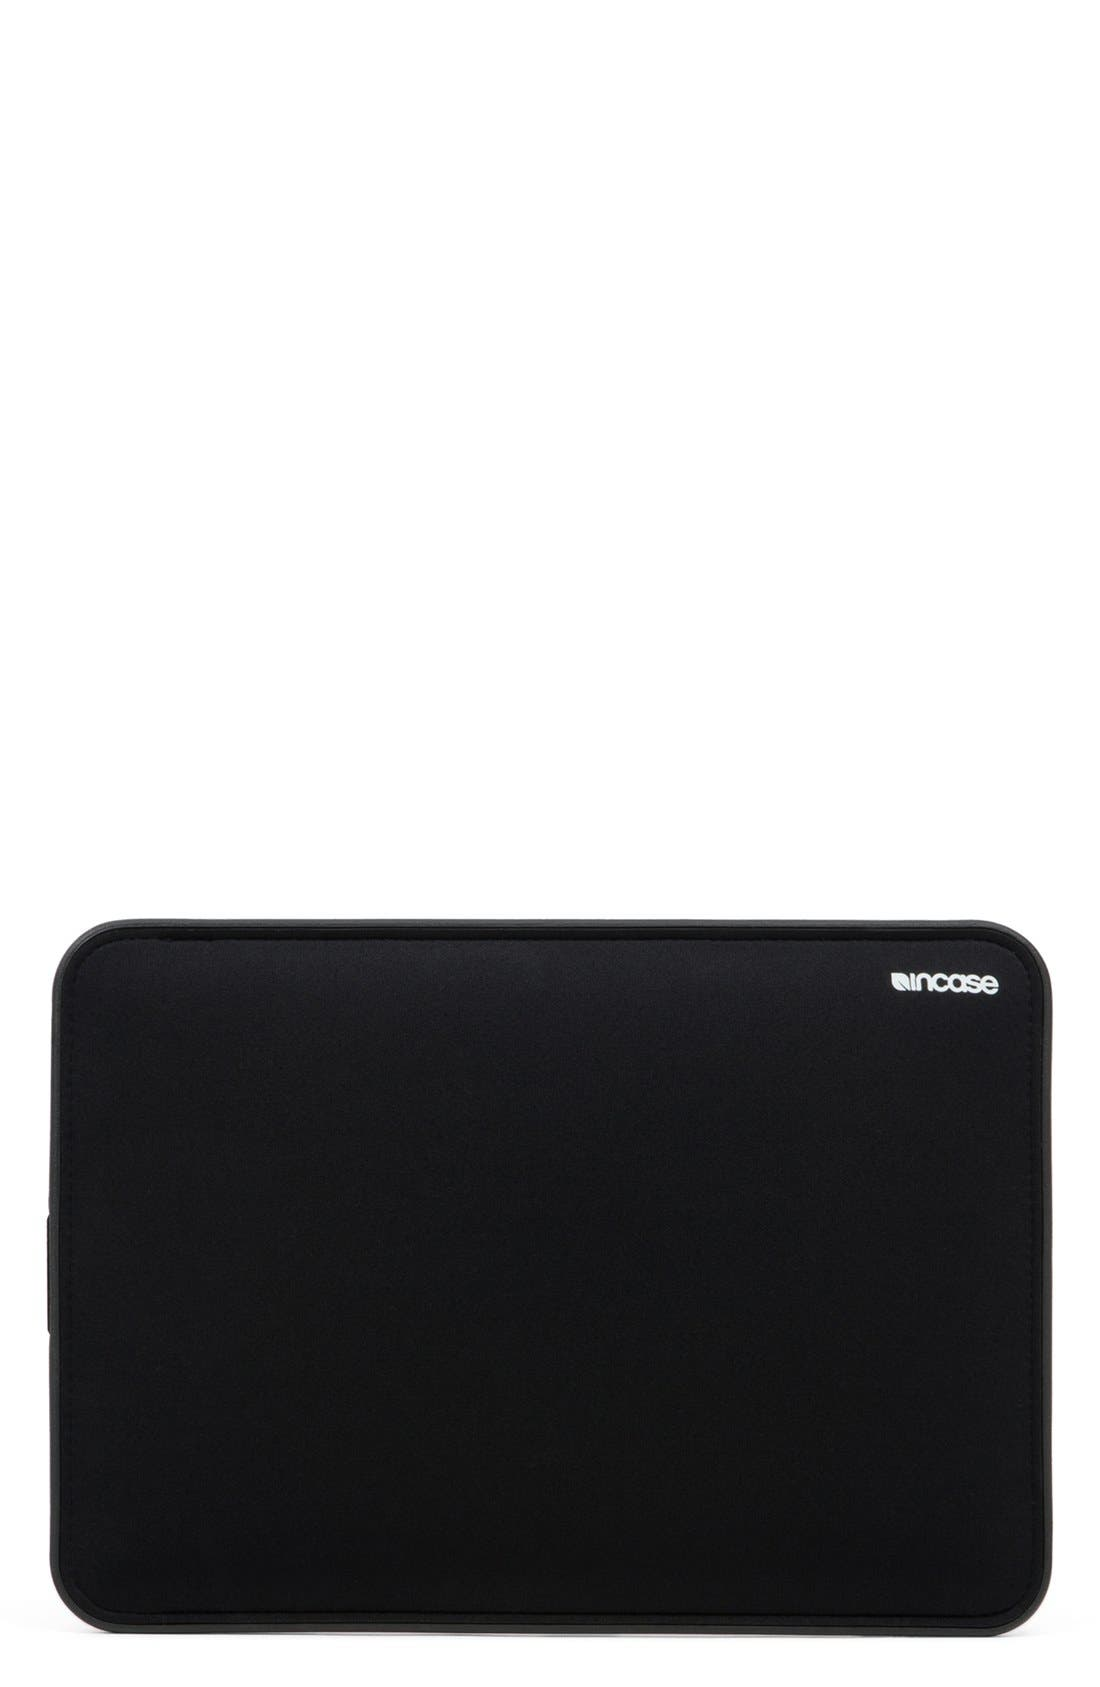 Incase Designs 'Icon' MacBook Air Laptop Sleeve (13 Inch)